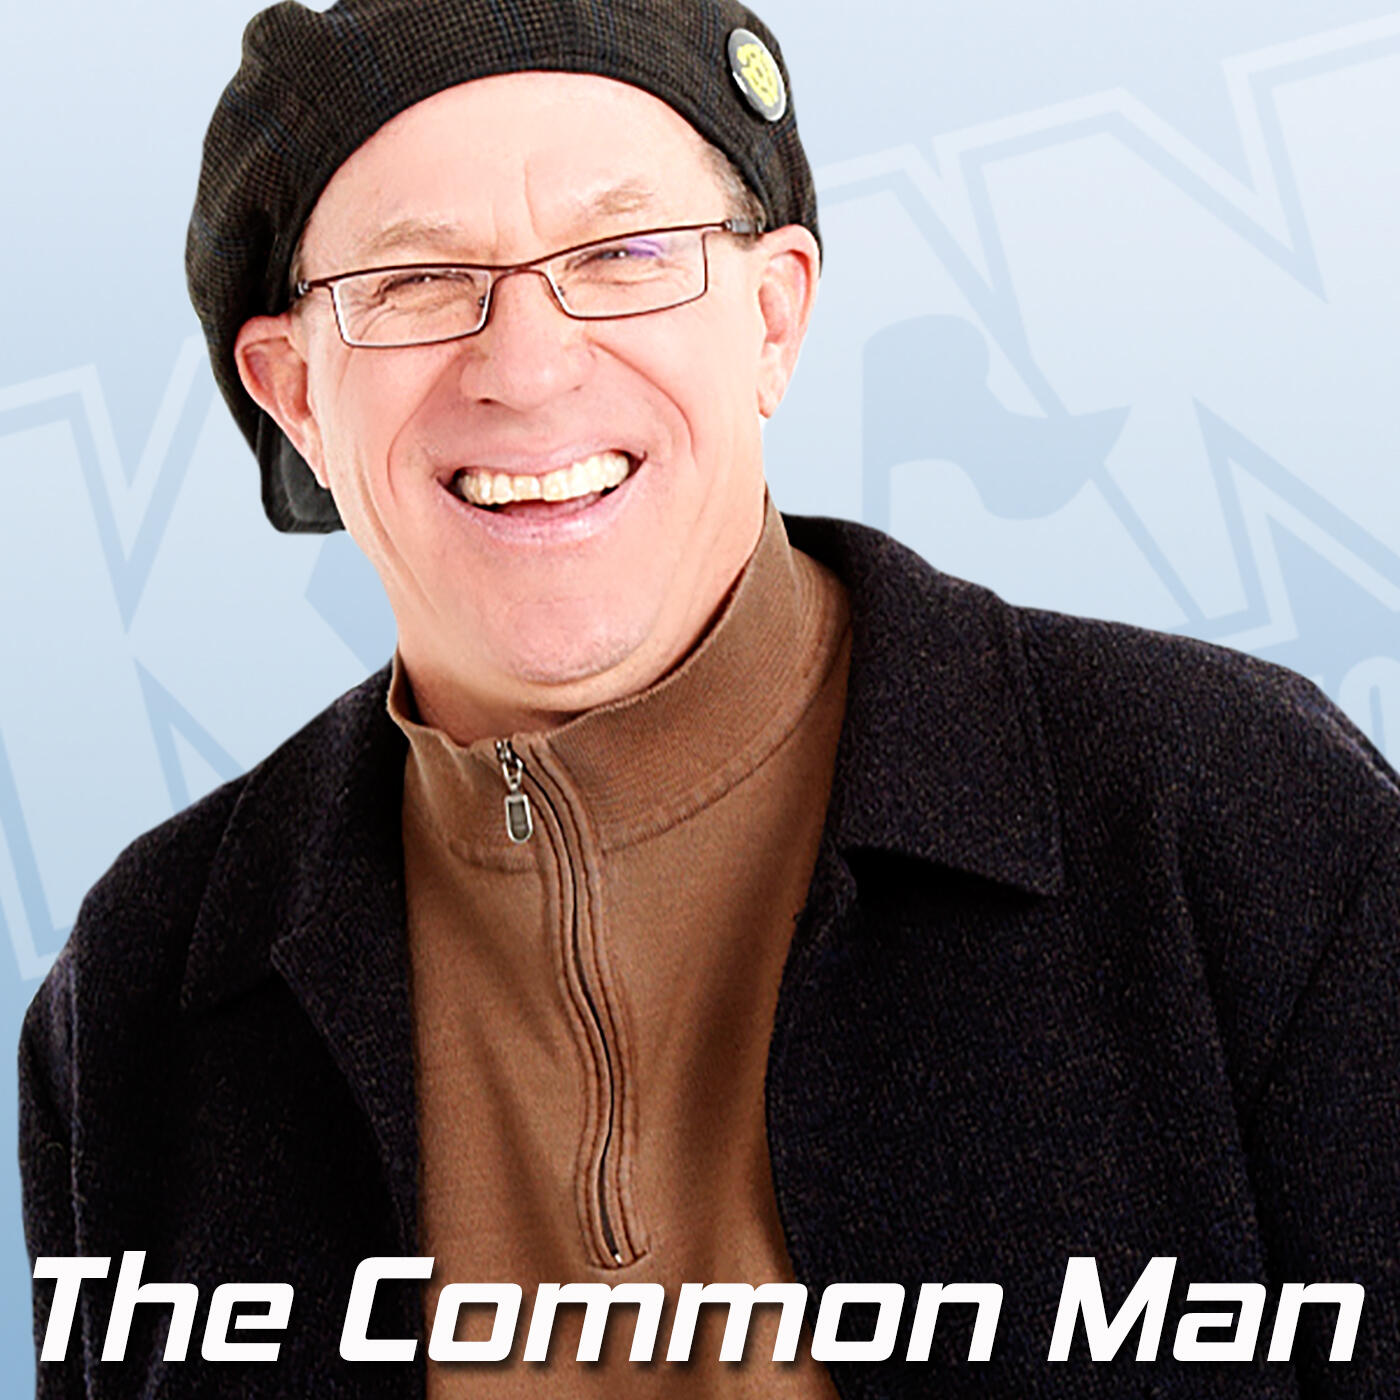 Listen to the Common Man - KFAN FM 100.3 Episode - FULL PROGRUM! DEADLINE! on iHeartRadio | iHeartRadio